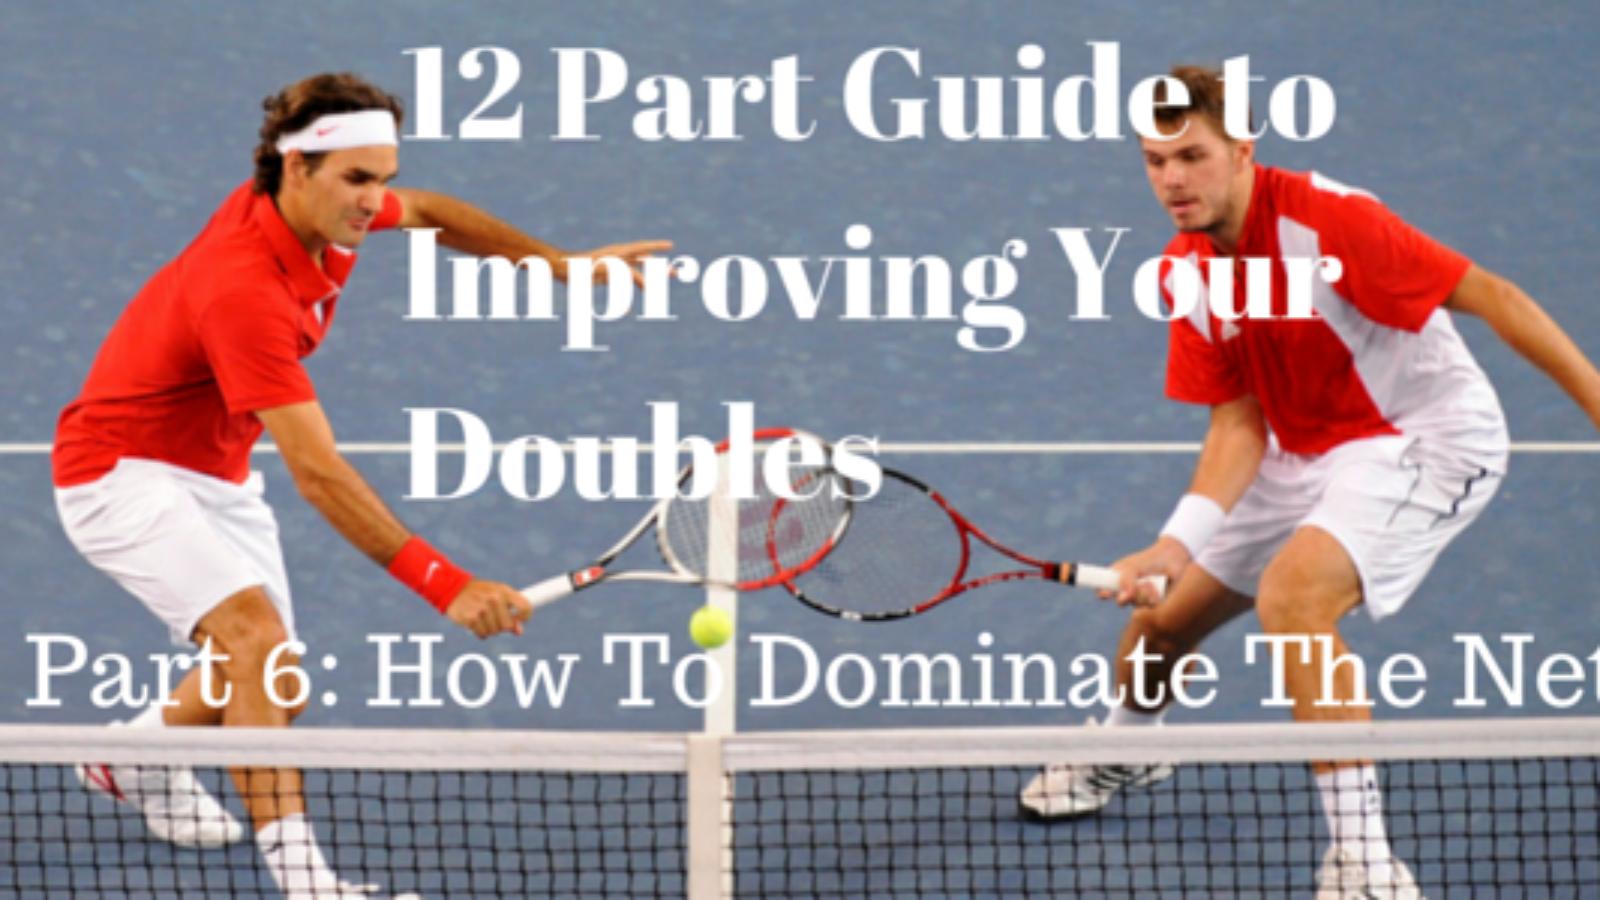 Dominate the net header